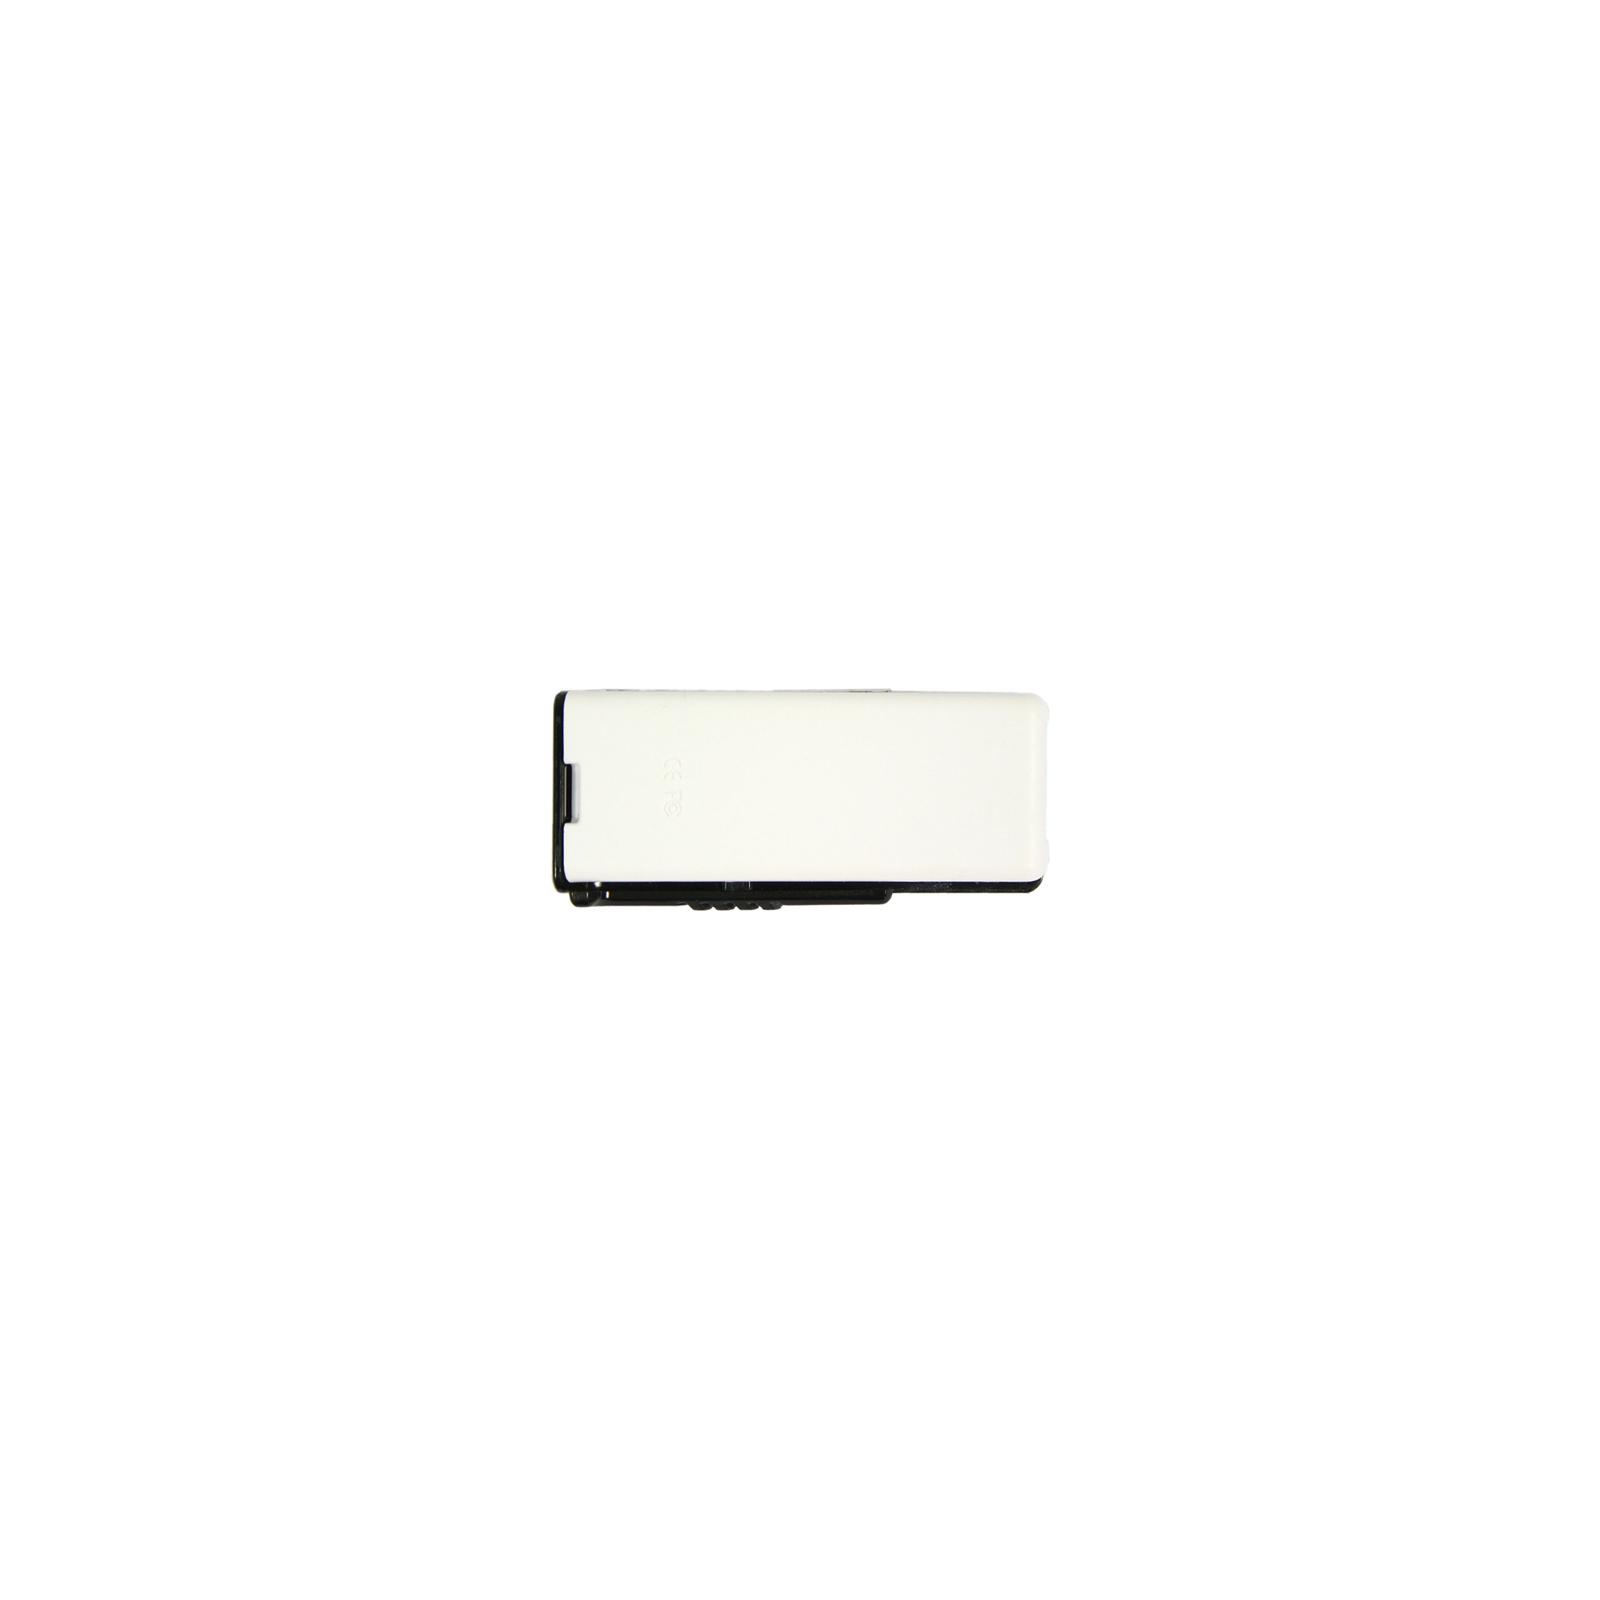 USB флеш накопитель 32GB AH350 Black RP USB3.0 Apacer (AP32GAH350B-1) изображение 2